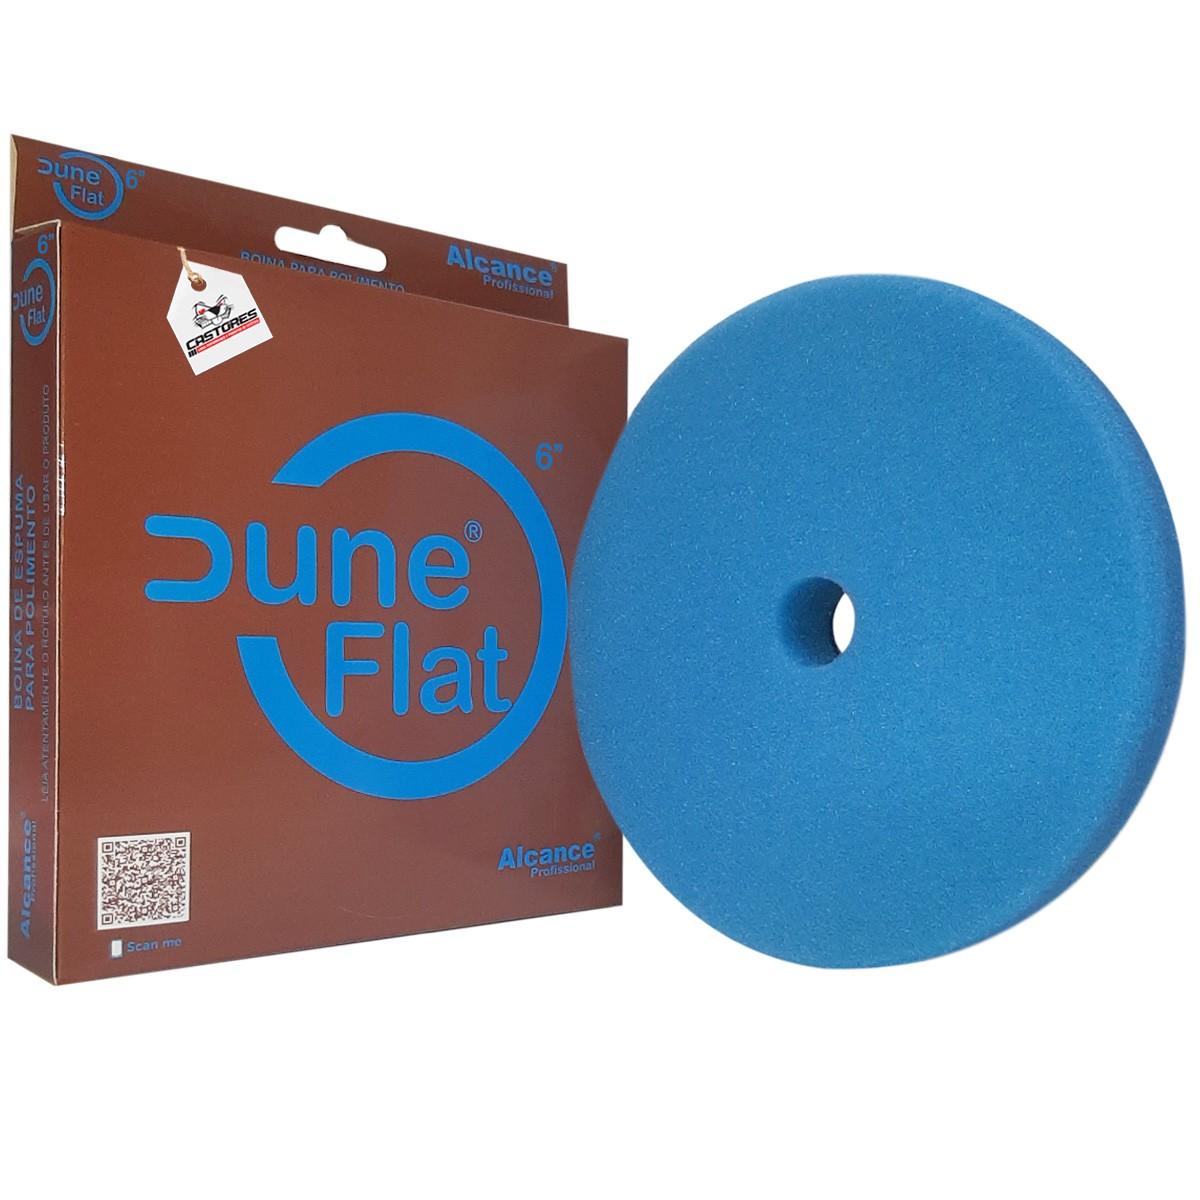 "Boina de Espuma  Super Agressiva Dune Flat Azul 6"" Corte  - Alcance Profissional"